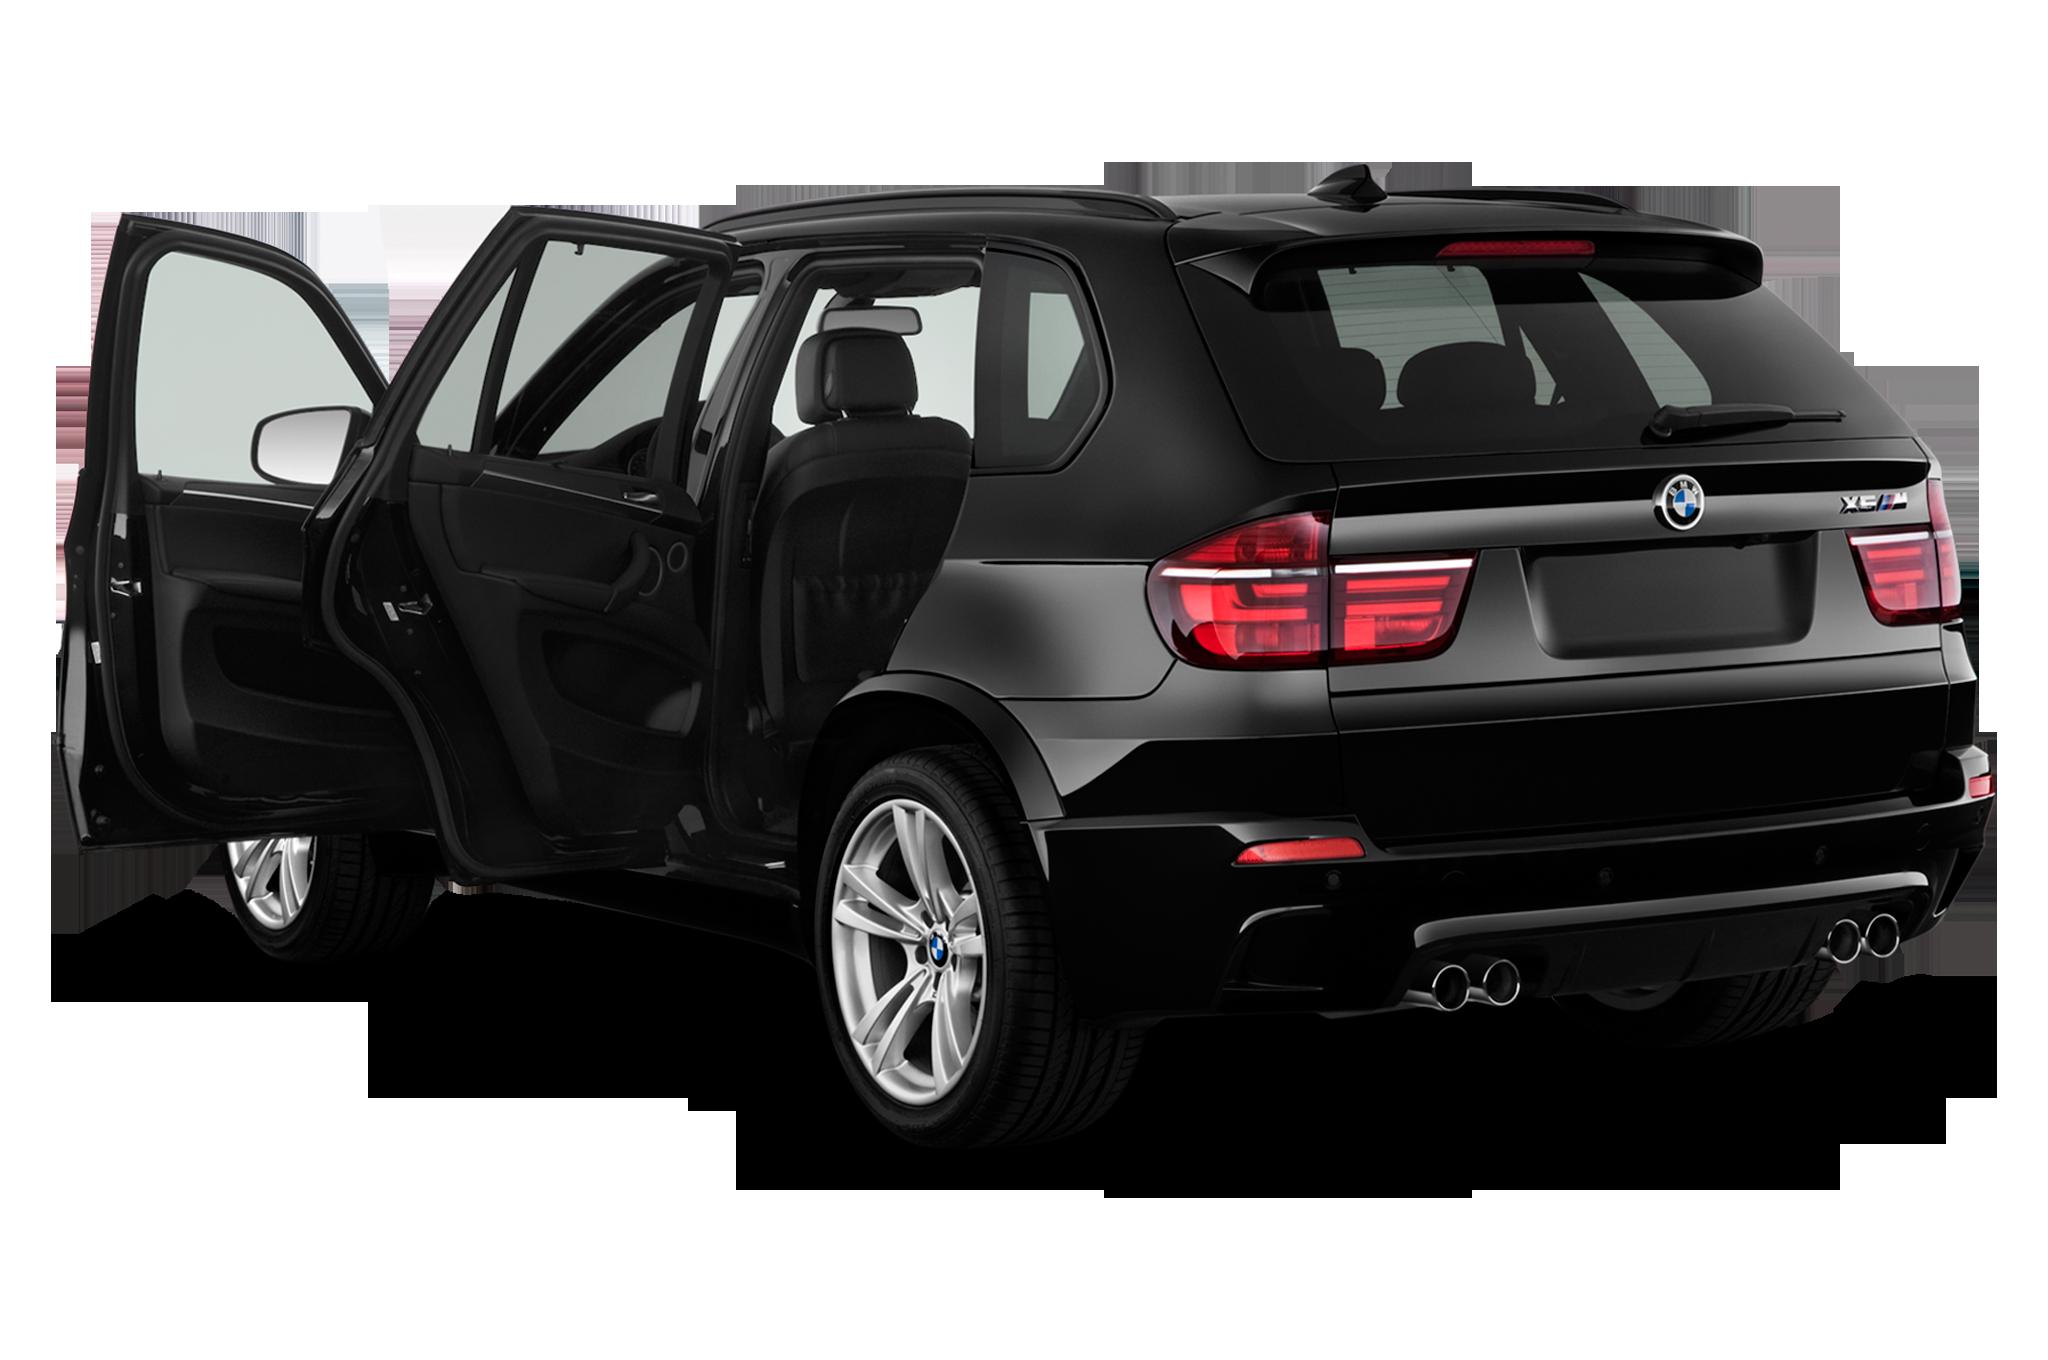 BMW X5 M I (E70) 2009 - 2014 SUV 5 door #7